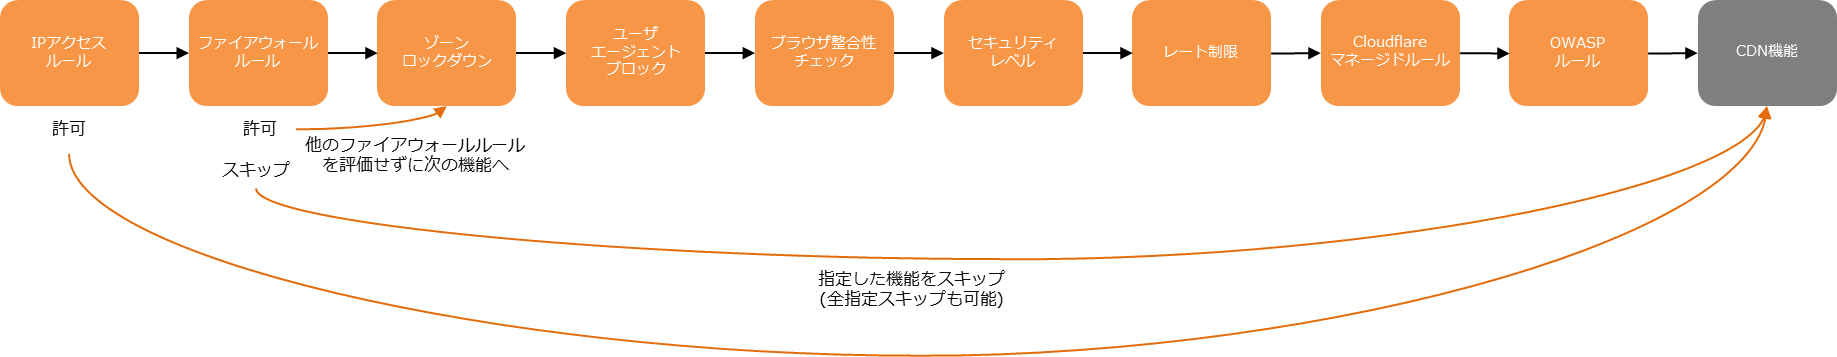 20210412_cloudflare_waf_3_fig4.png